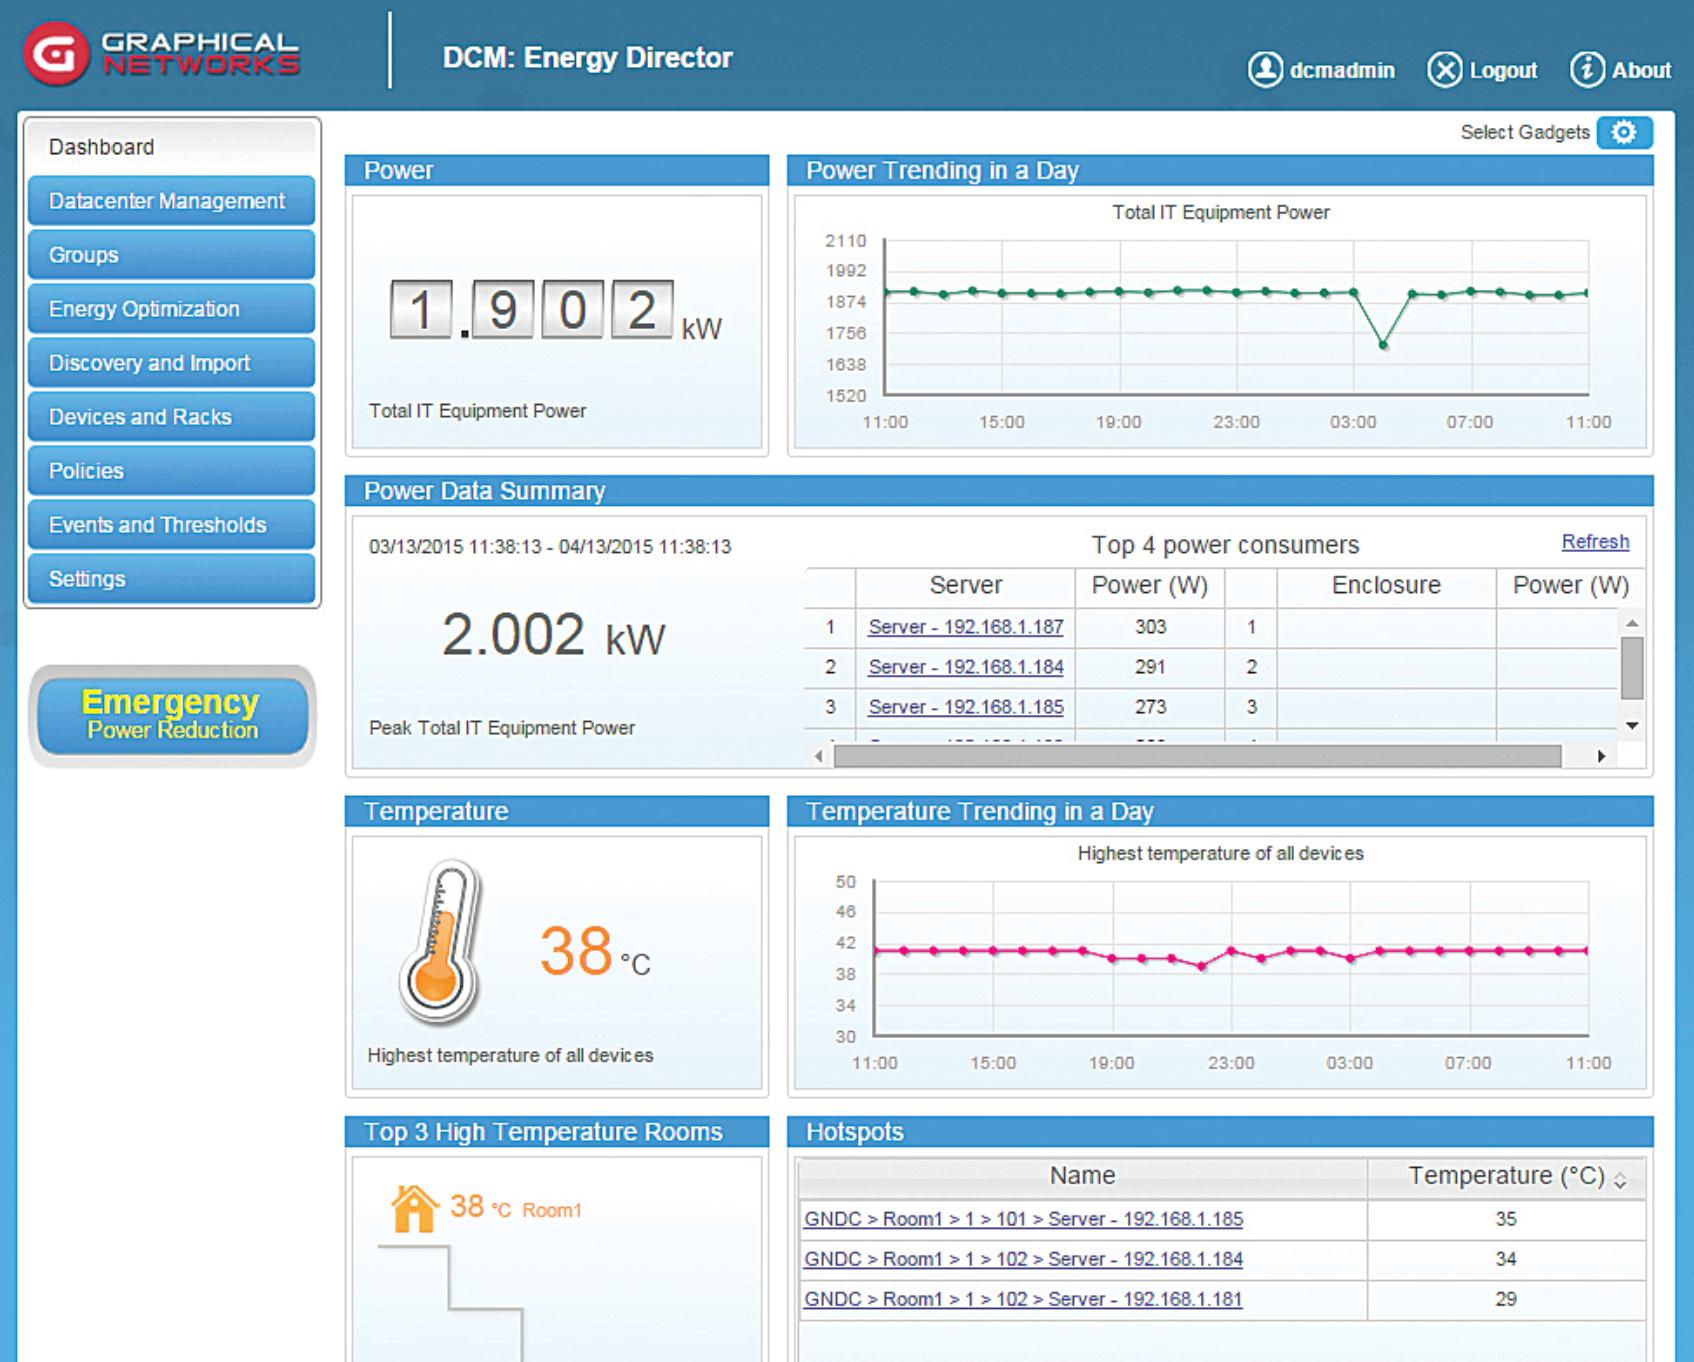 netTerrain DCIM Software - netTerrain Power Usage Dashboard